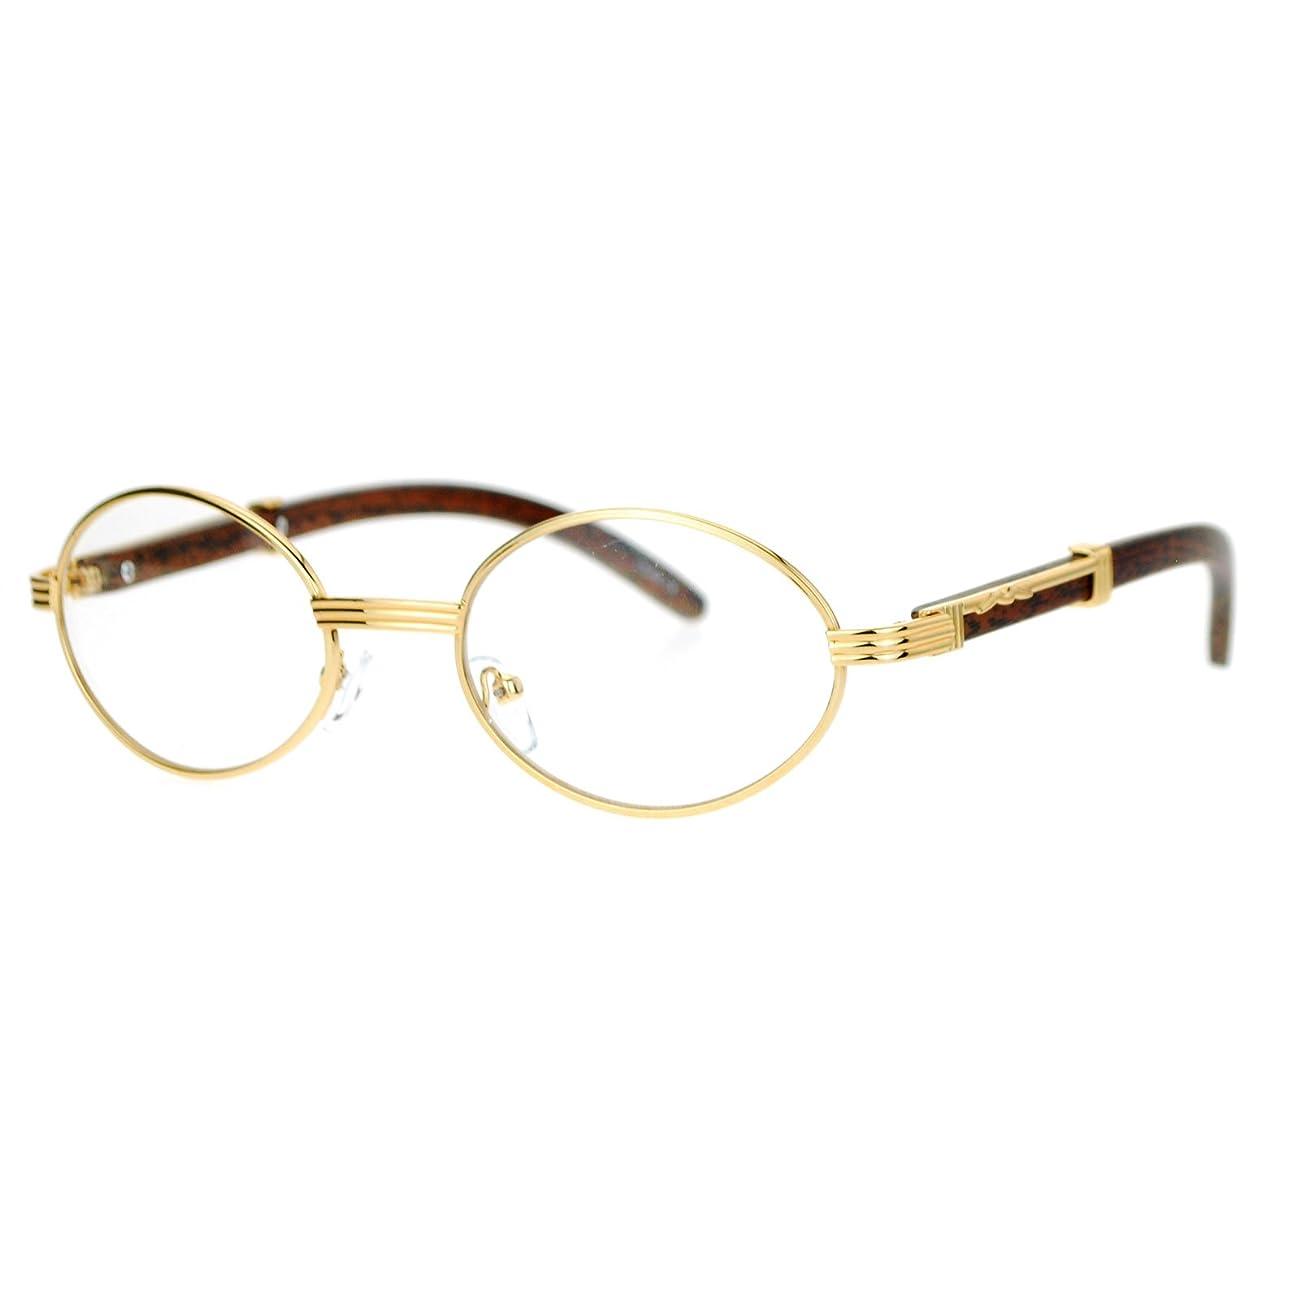 SA106 Art Nouveau Vintage Style Oval Metal Frame Eye Glasses 0